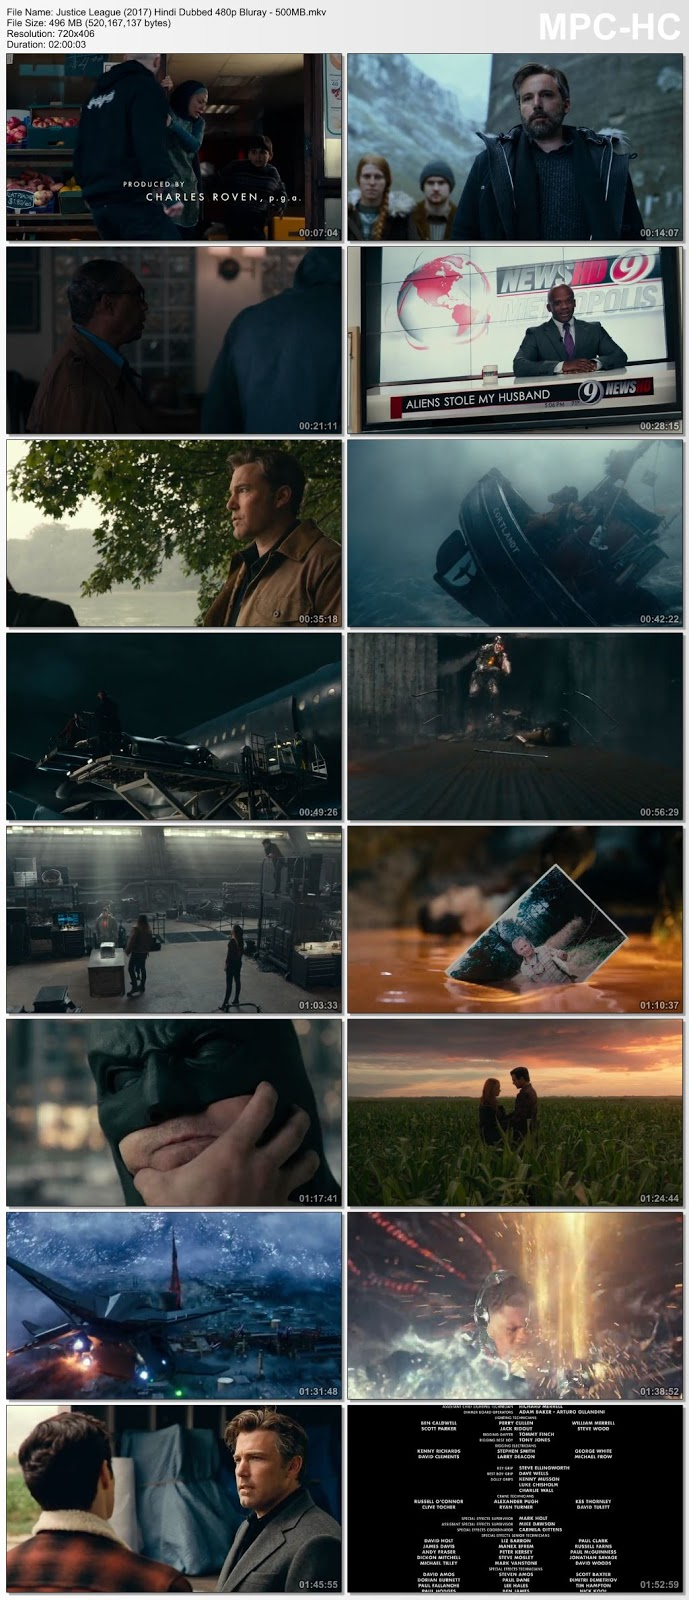 Justice League (2017) 480p BluRay Hindi Dubbed – 500MB Desirehub